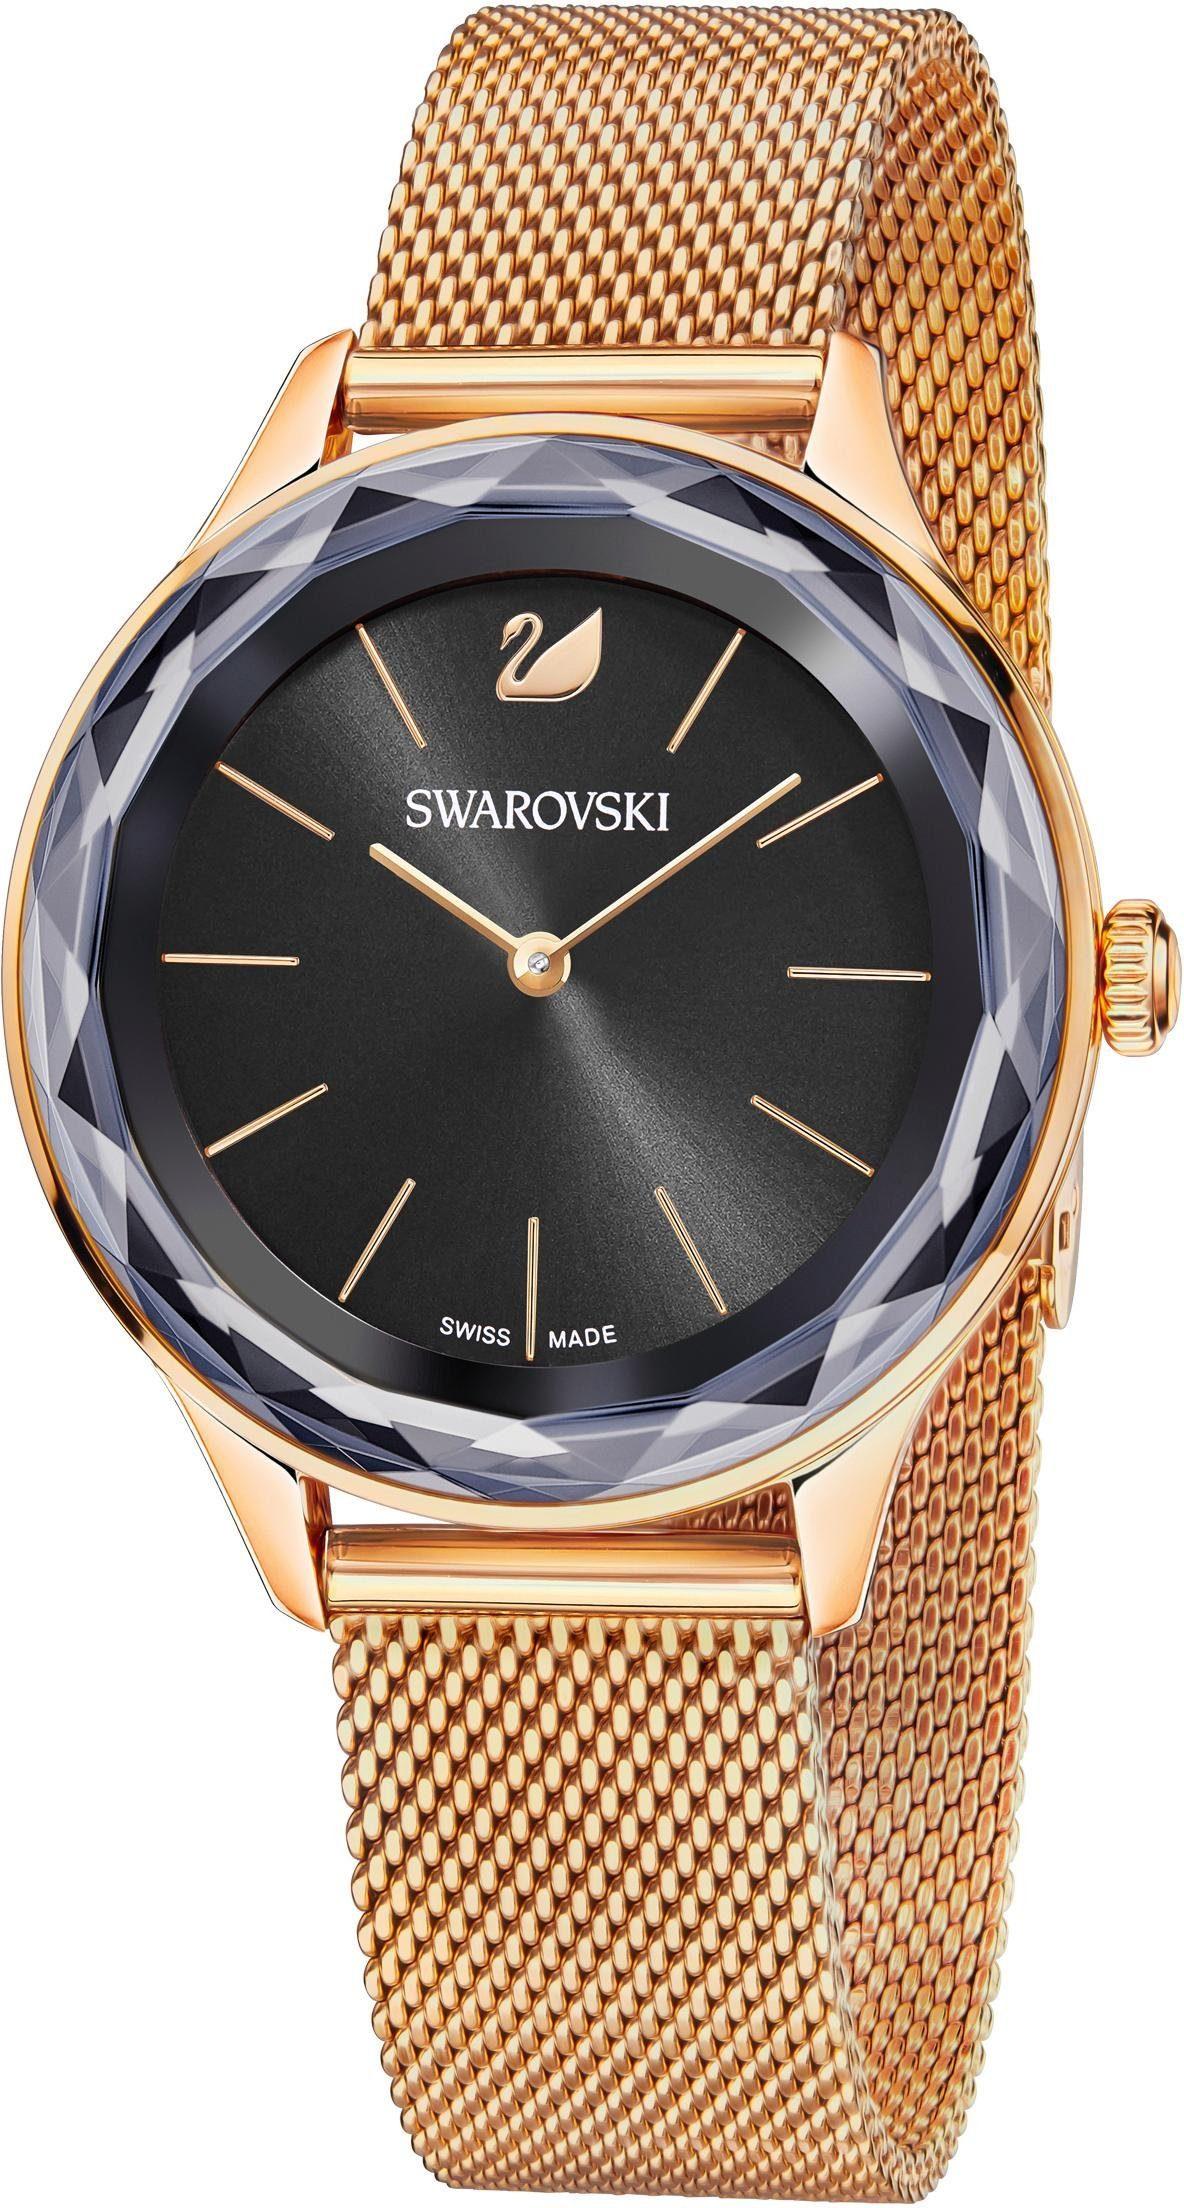 Swarovski Schweizer Uhr »Octea Nova, 5430424«